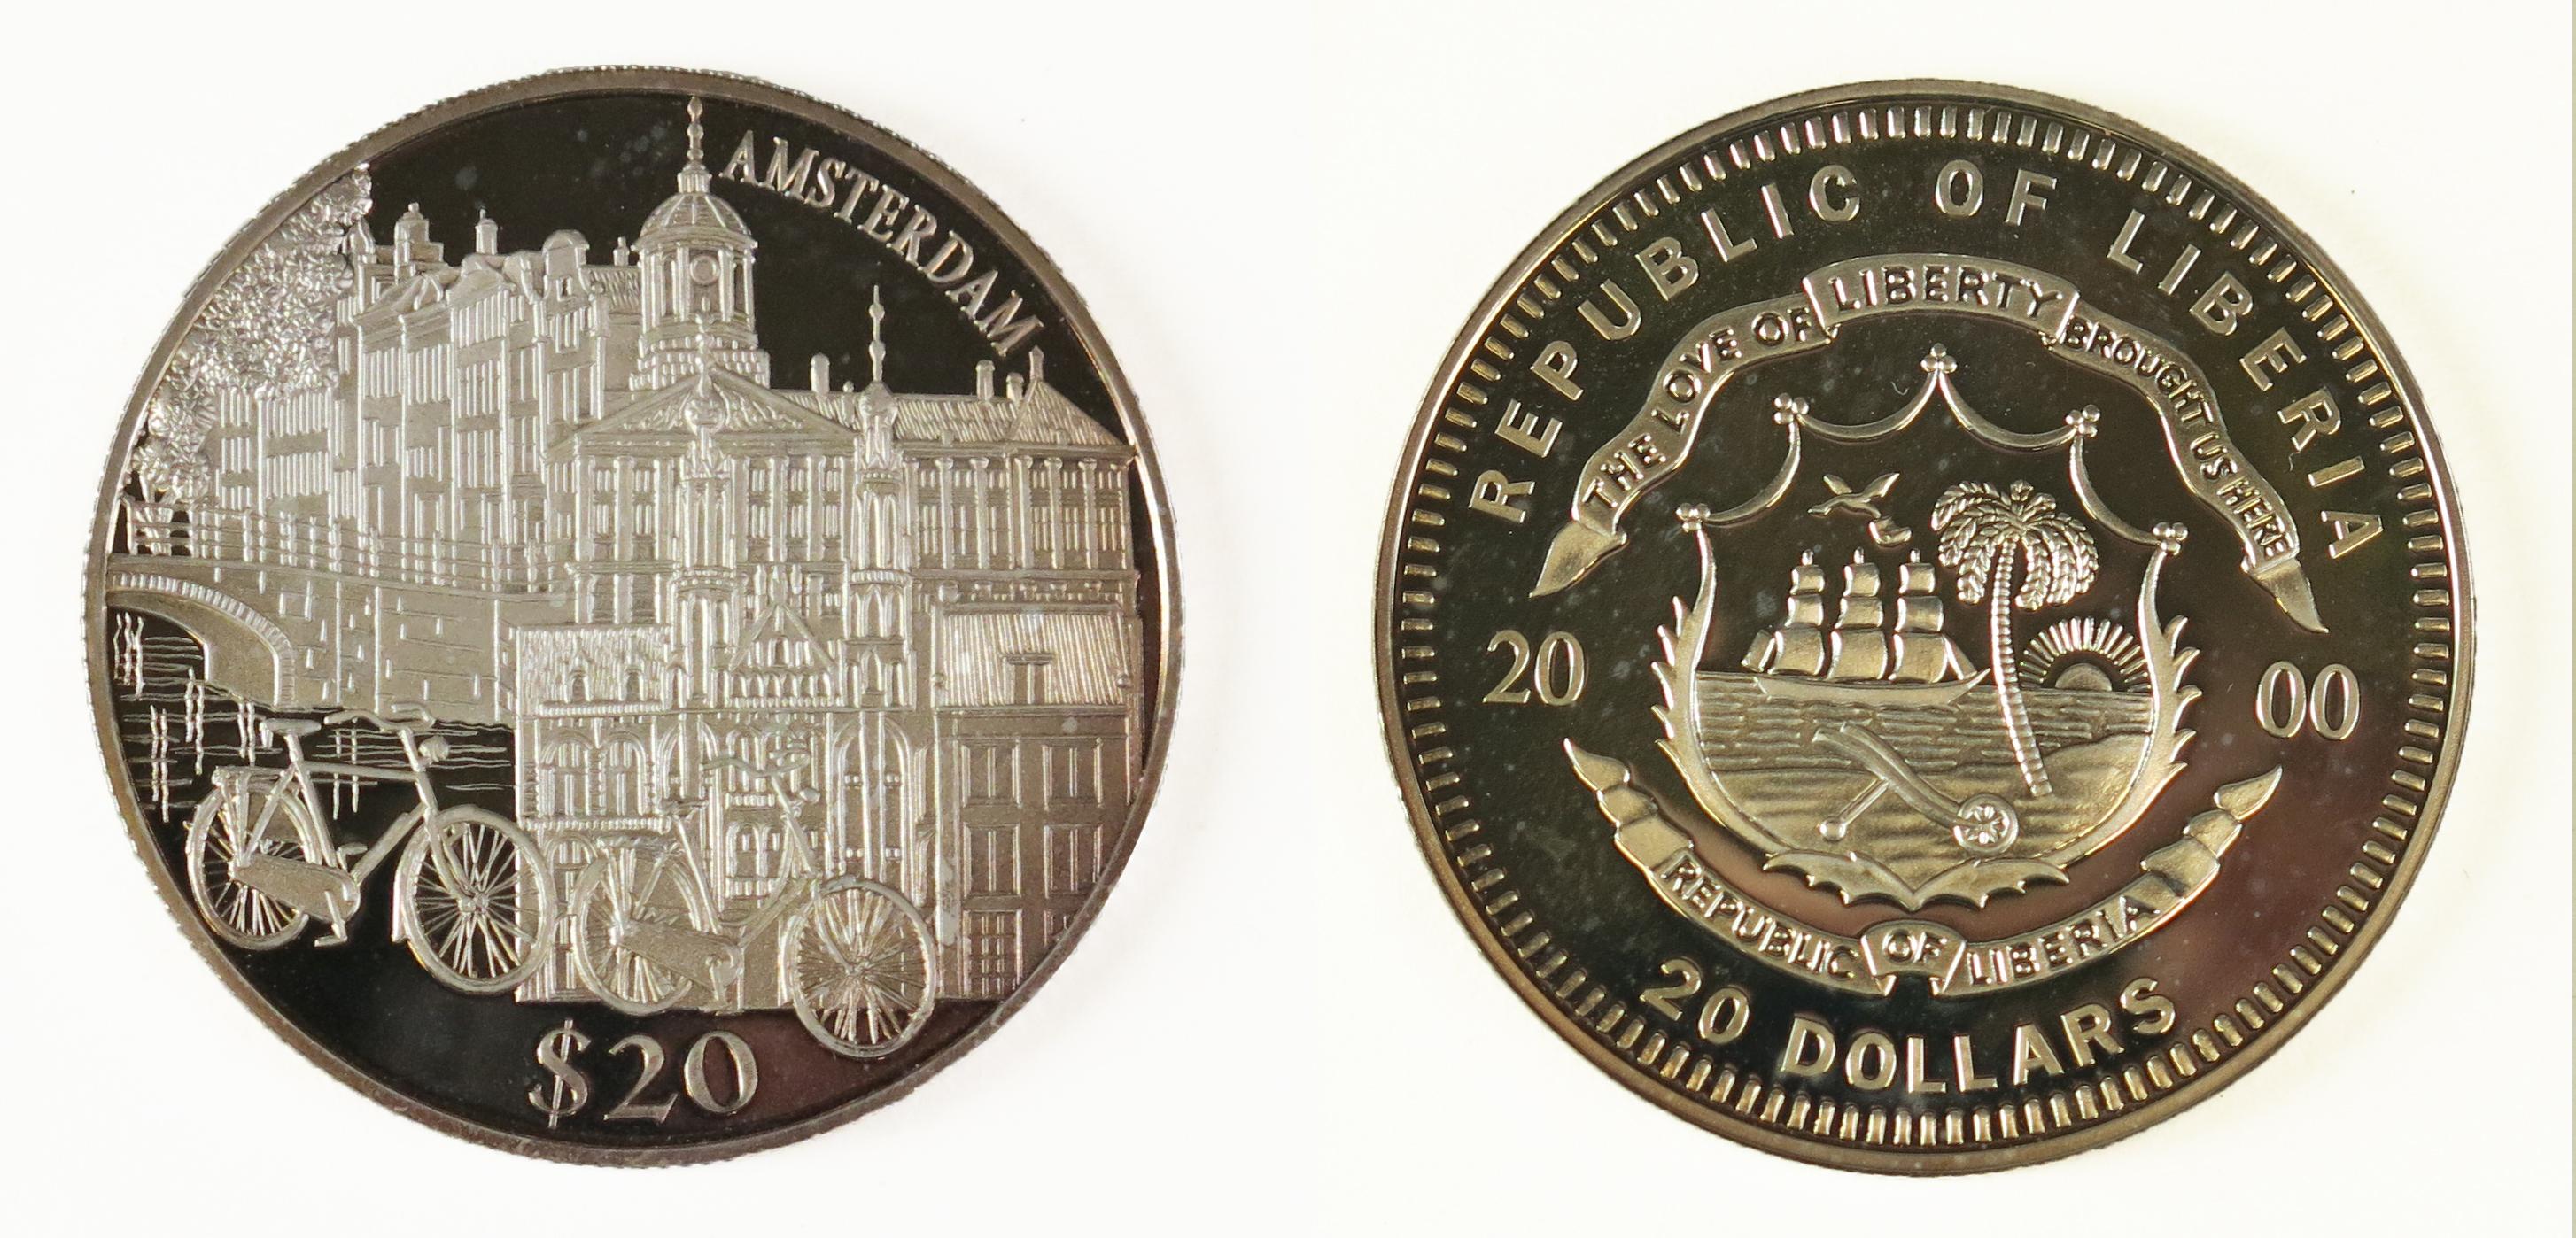 Twintig-dollarmunt uit Liberia, met Amsterdams stadsgezicht